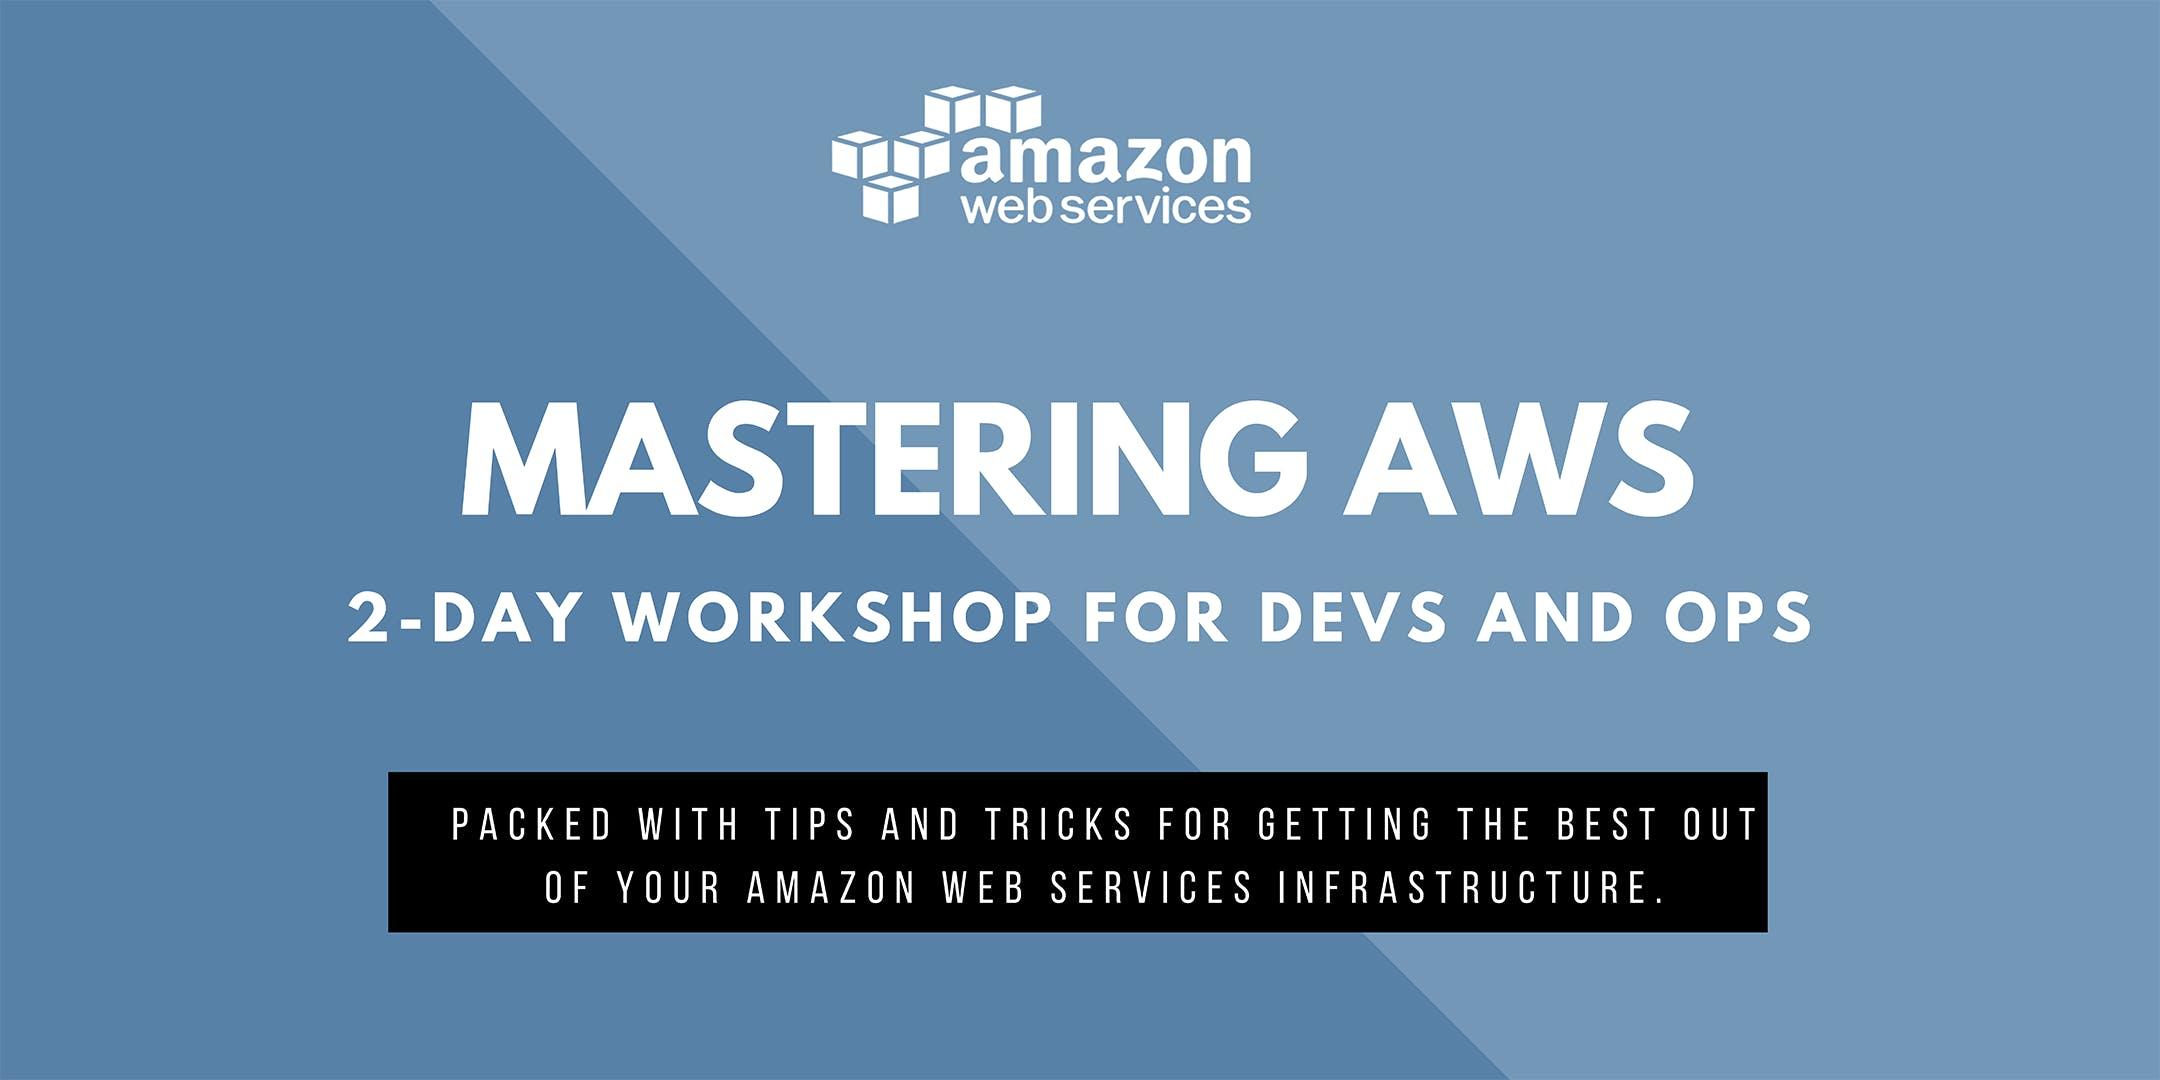 TOP Mastering Amazon Web Services (Zrich)